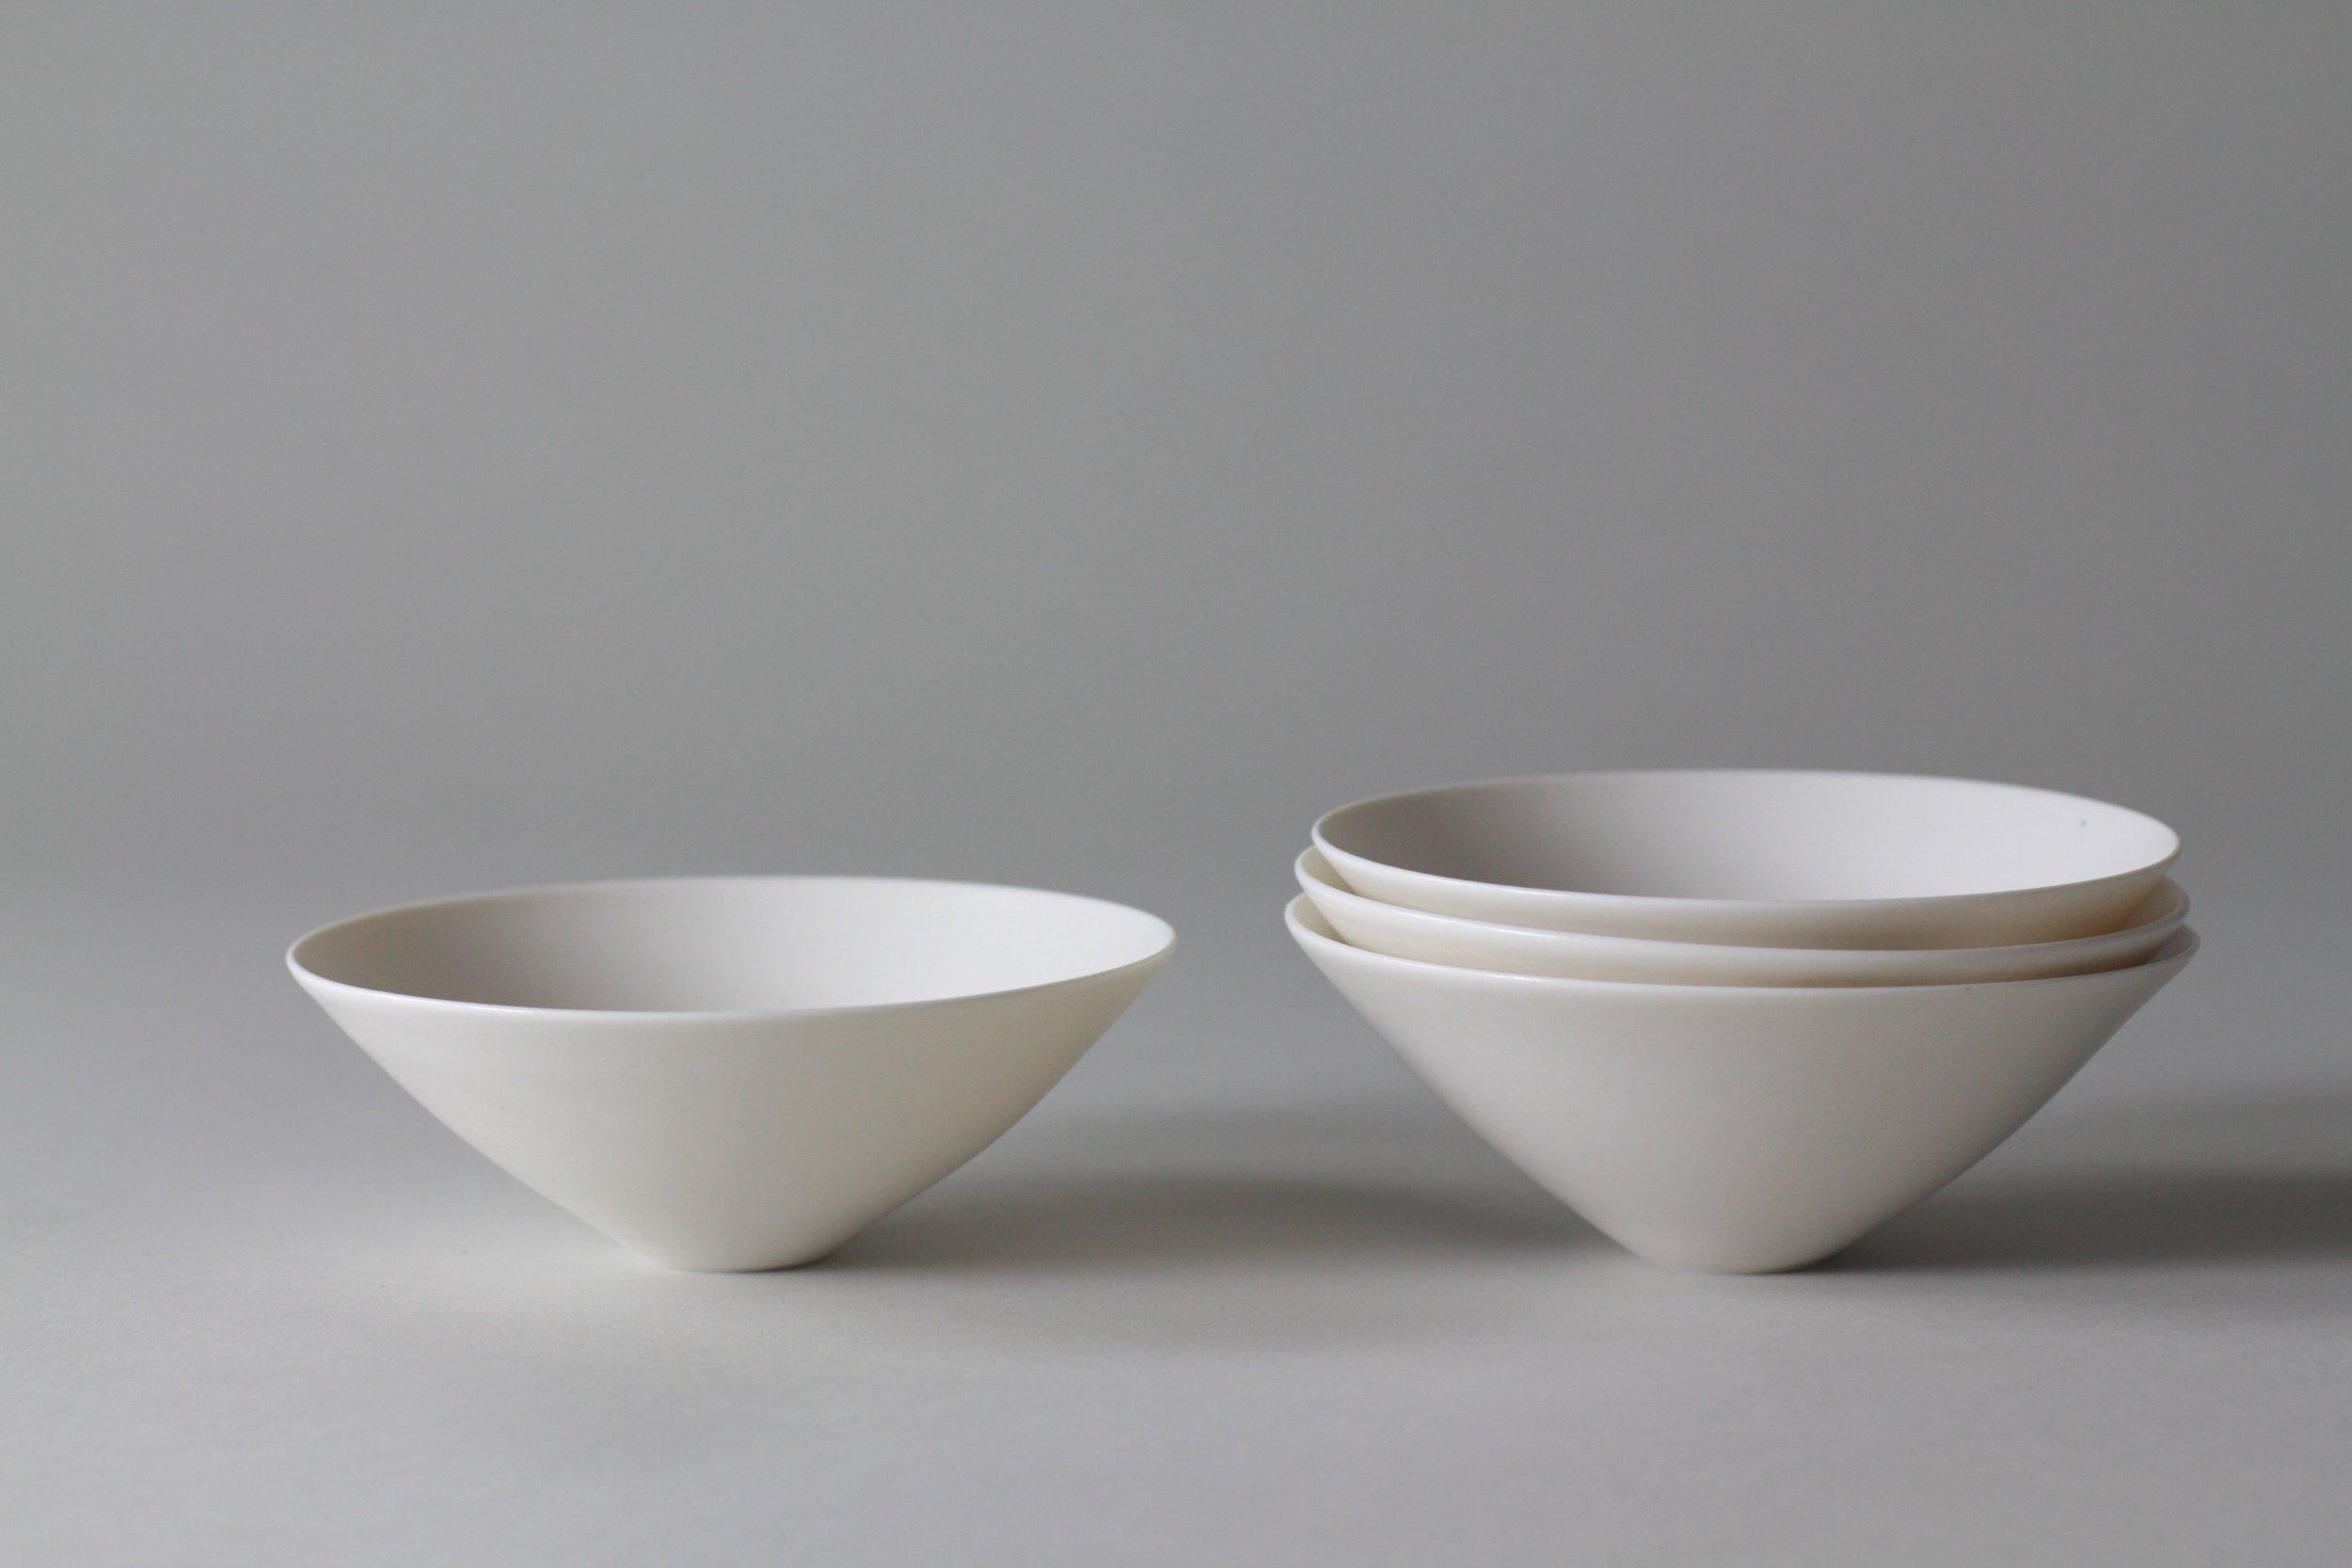 Porcelain ceramic white bowls by Lilith Rockett, Portland, Oregon